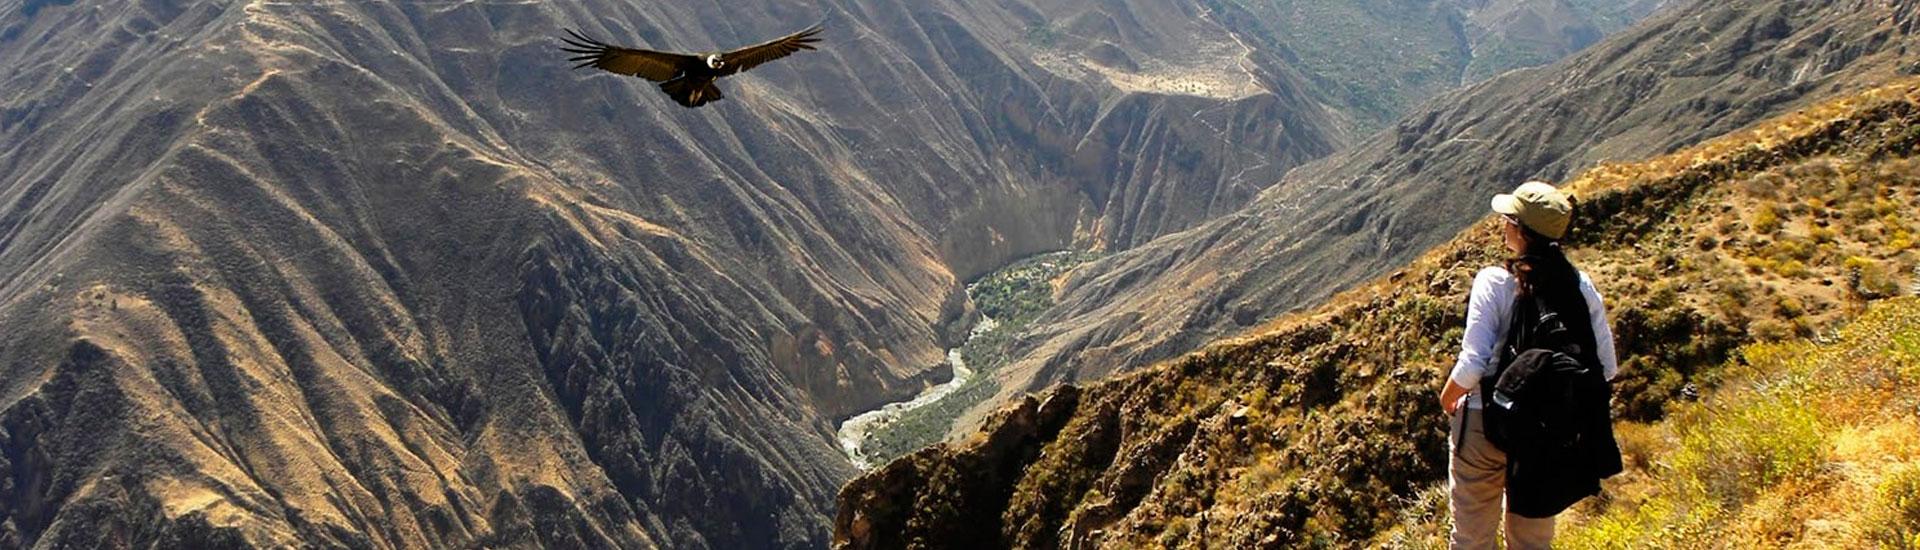 Colca Canyon 01 Day.